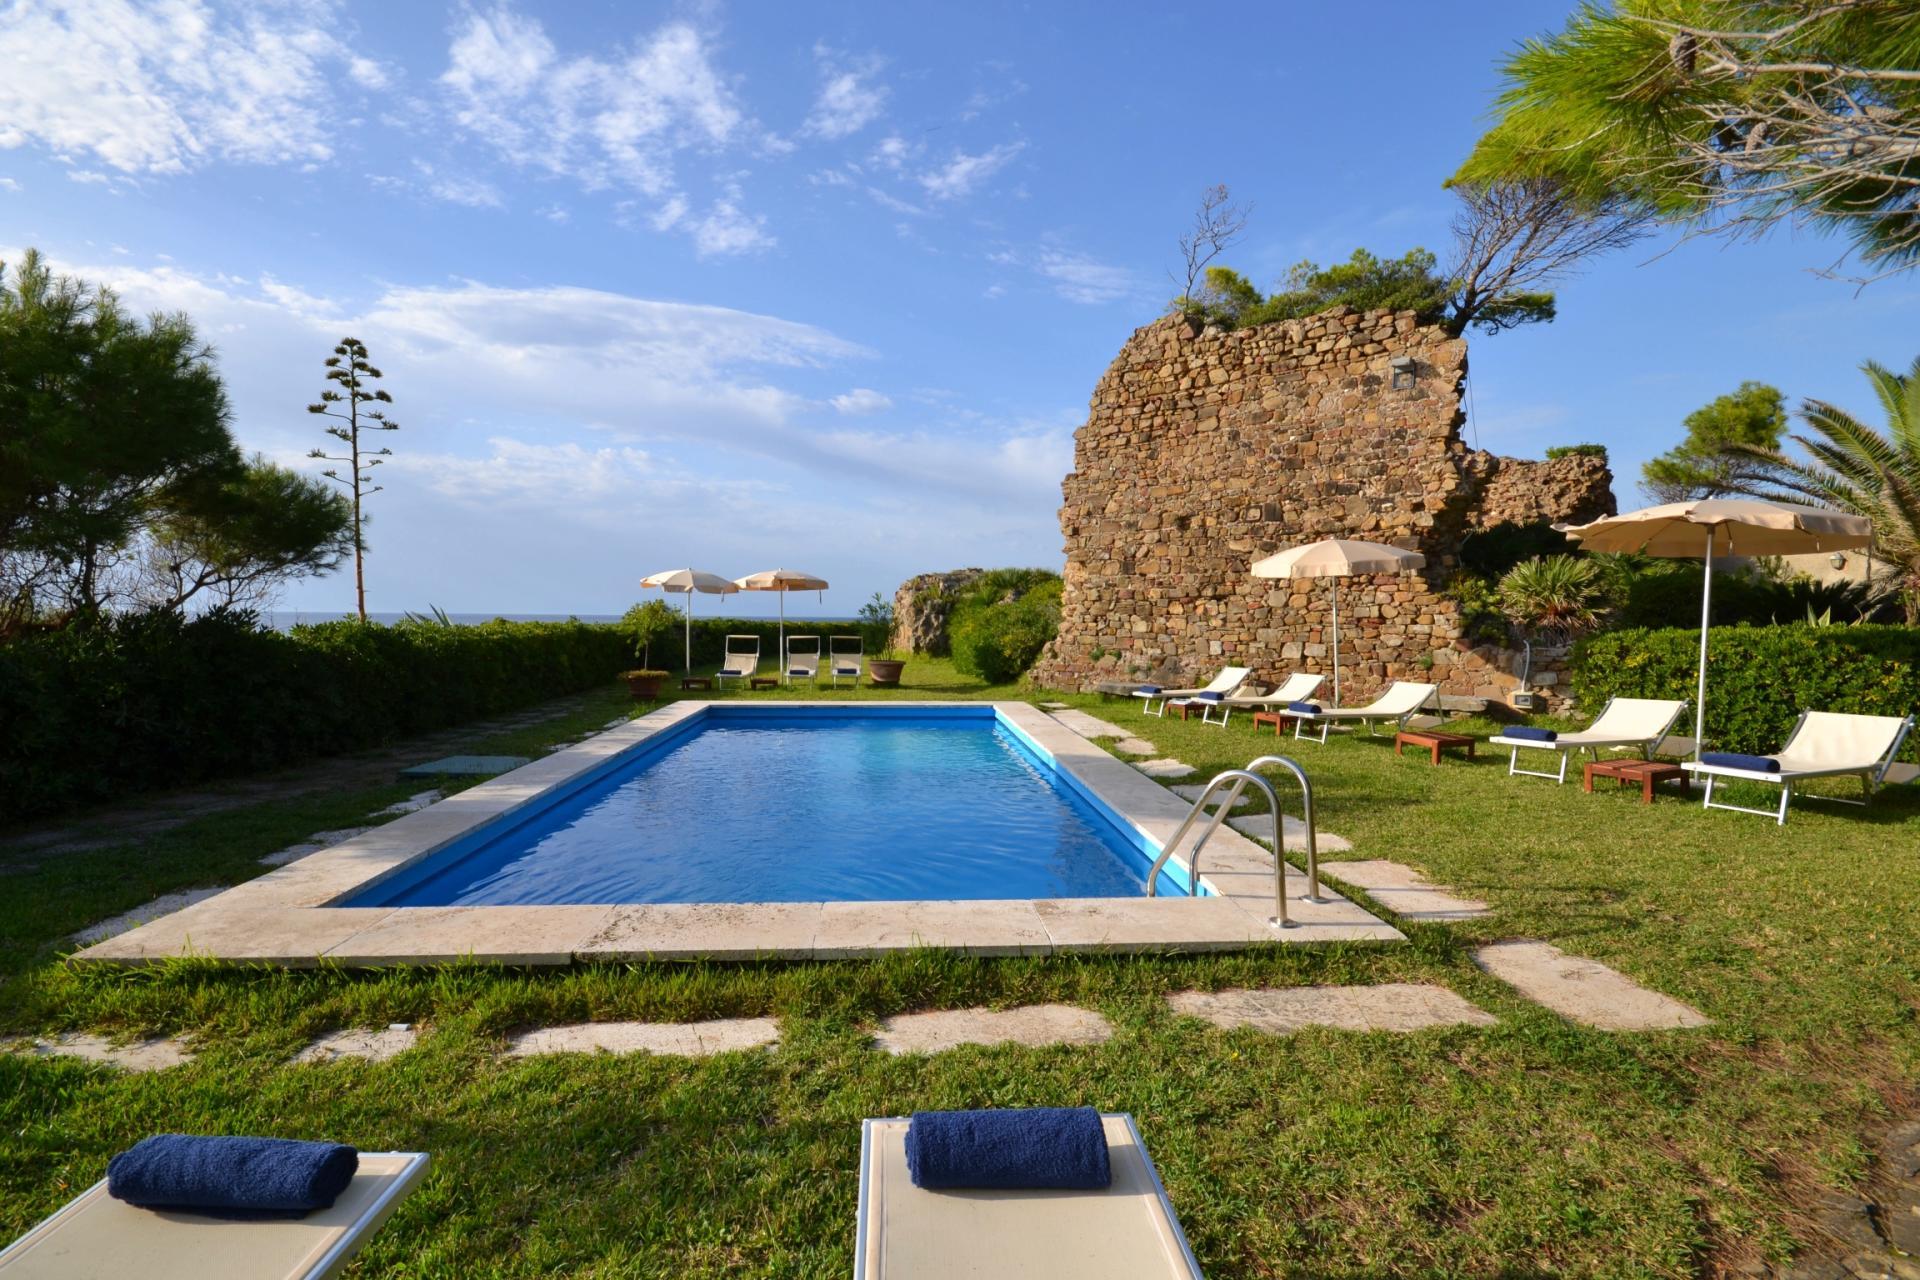 Outdoor Pool, Faro di Ulisse, Castellabate, Amalfi Coast Campania.